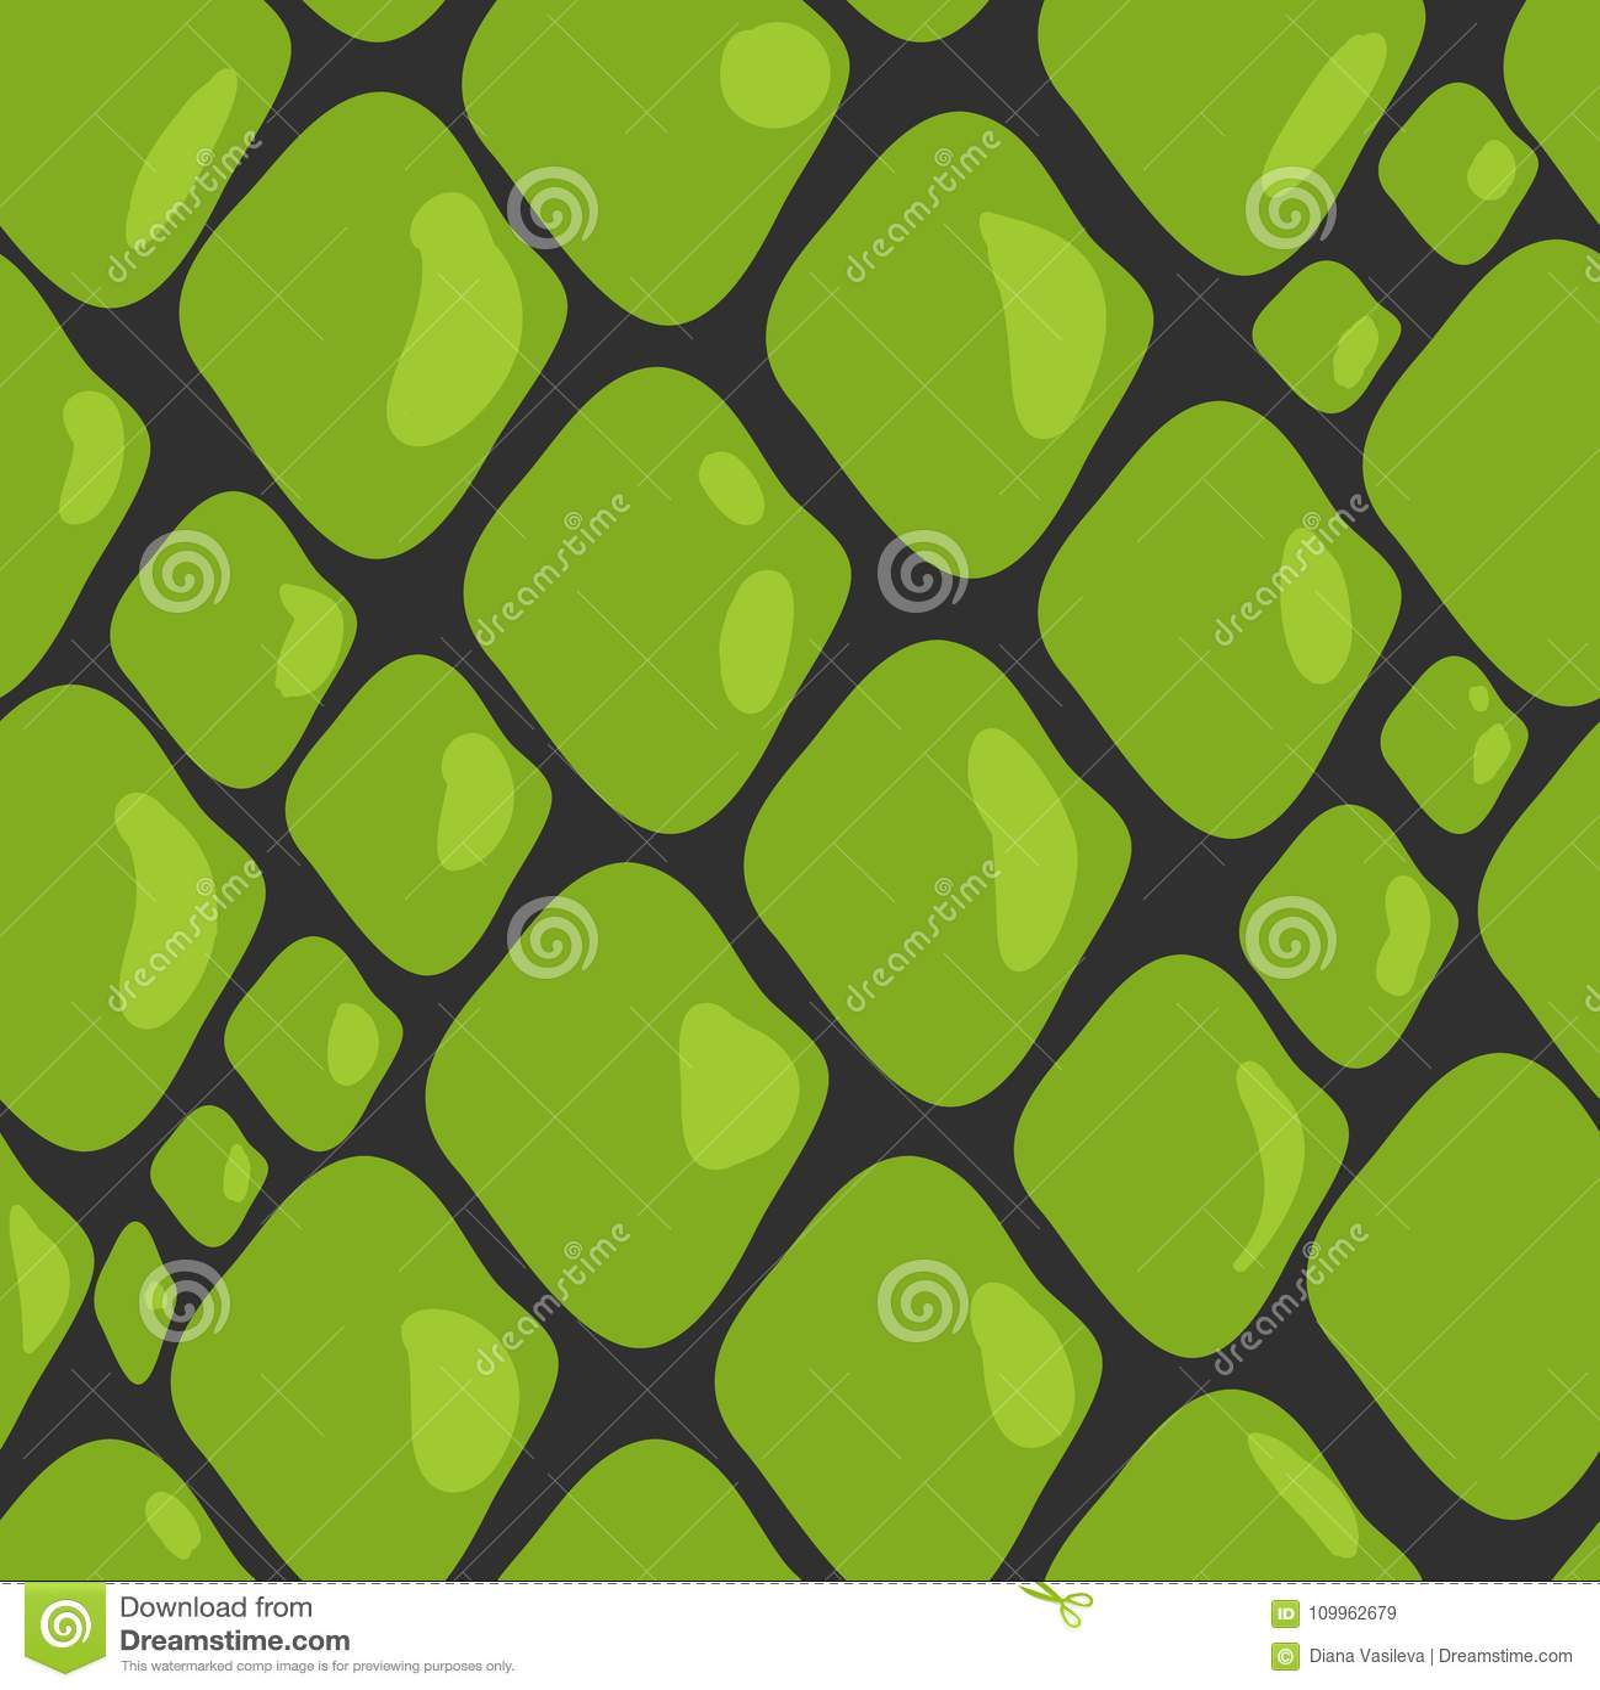 Vektor-Muster der grüne Schlangen-Haut